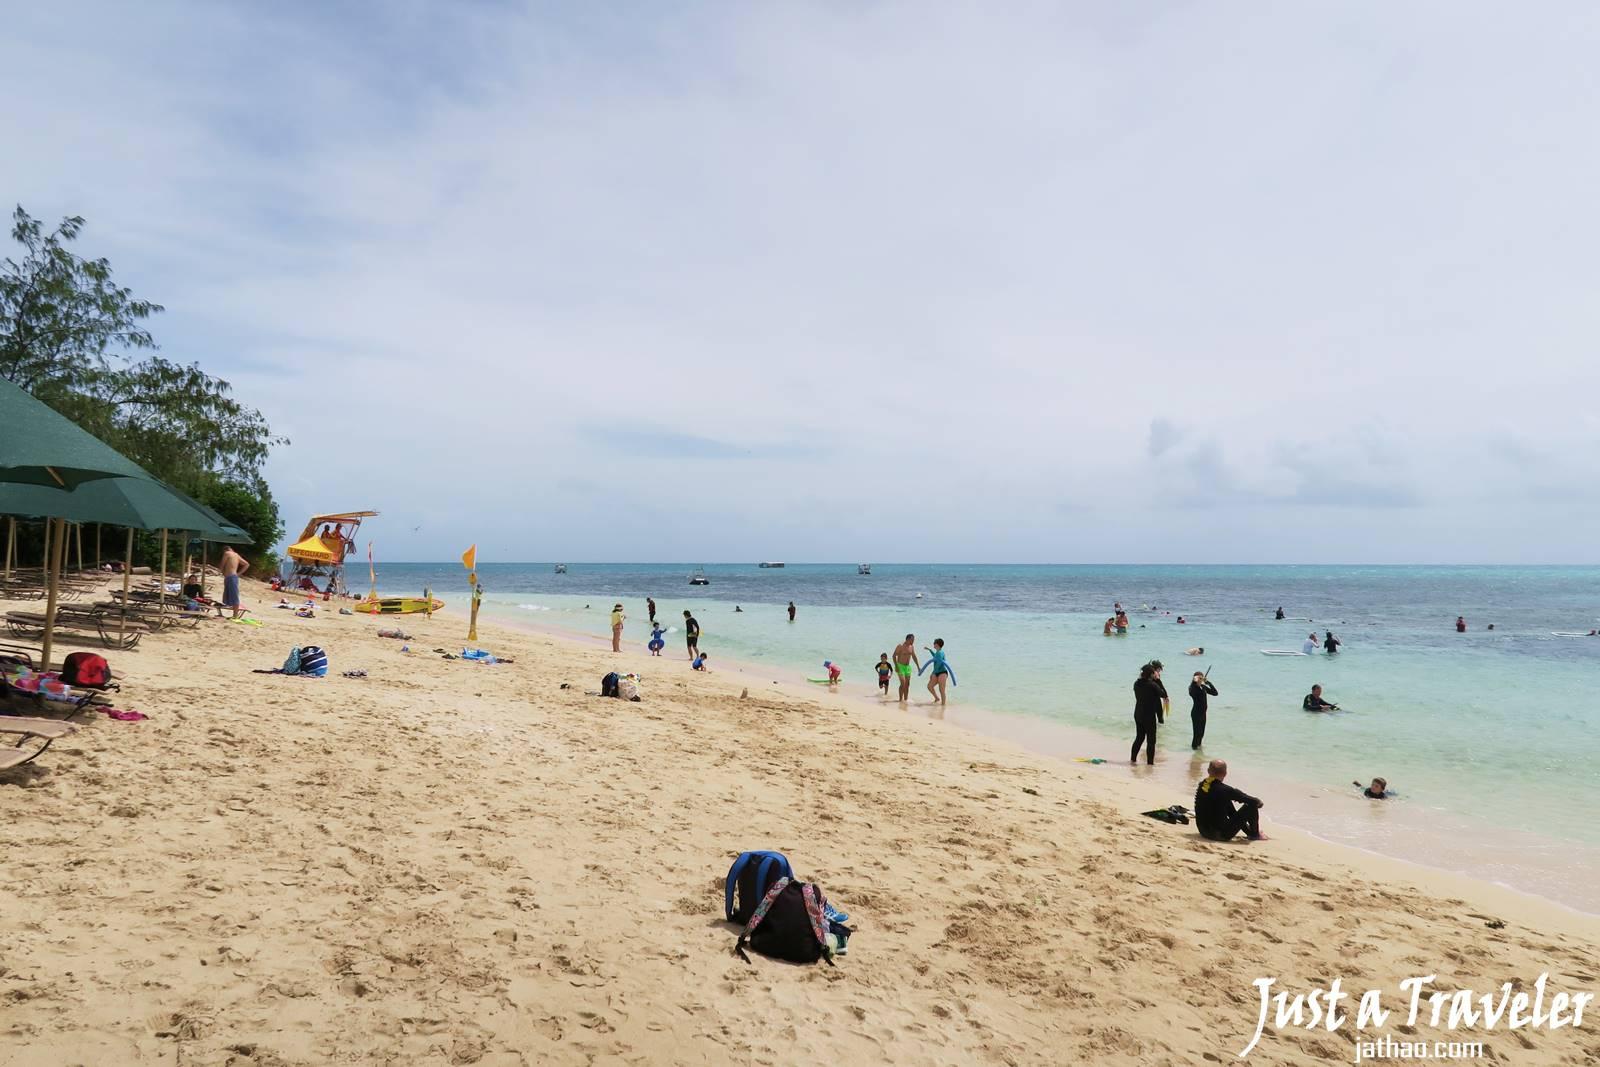 凱恩斯-大堡礁-綠島-海灘-內堡礁-浮潛-潛水-推薦-旅遊-自由行-澳洲-Carins-Great-Barrier-Reef-Green-Island-Beach-Snorkel-Diving-Travel-Australia